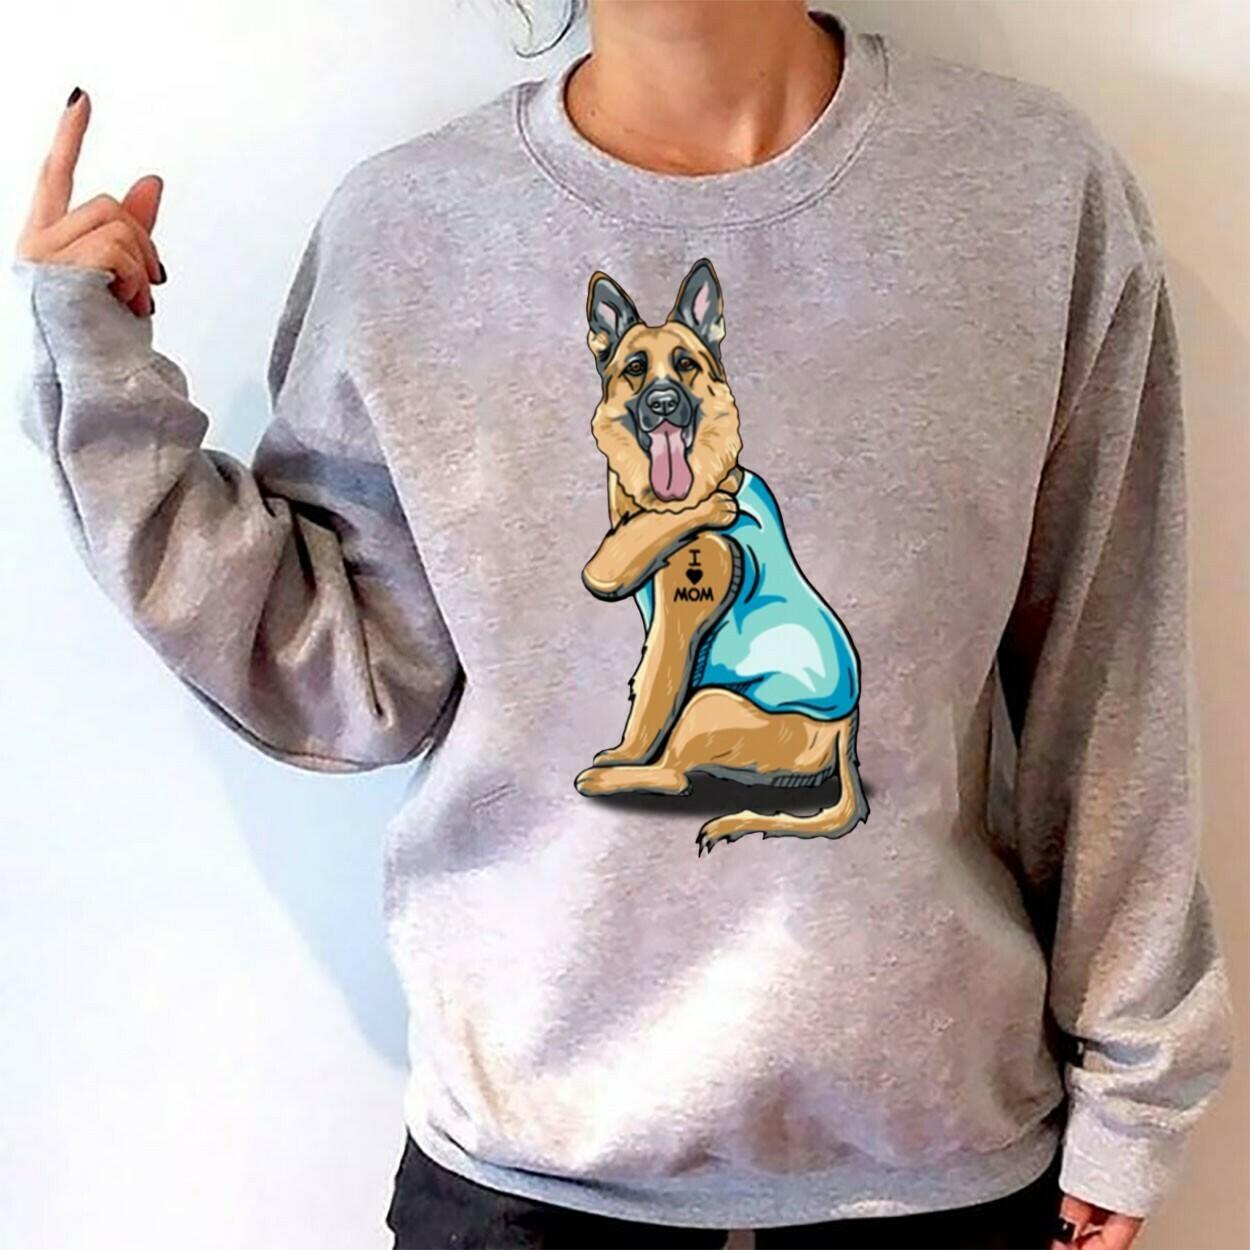 German Shepherd Dog Tattoos I Love Mom Funny Shirt T-Shirt Hoodie Sweatshirt Sweater Tee Kids Youth Gifts Jolly Family Gifts